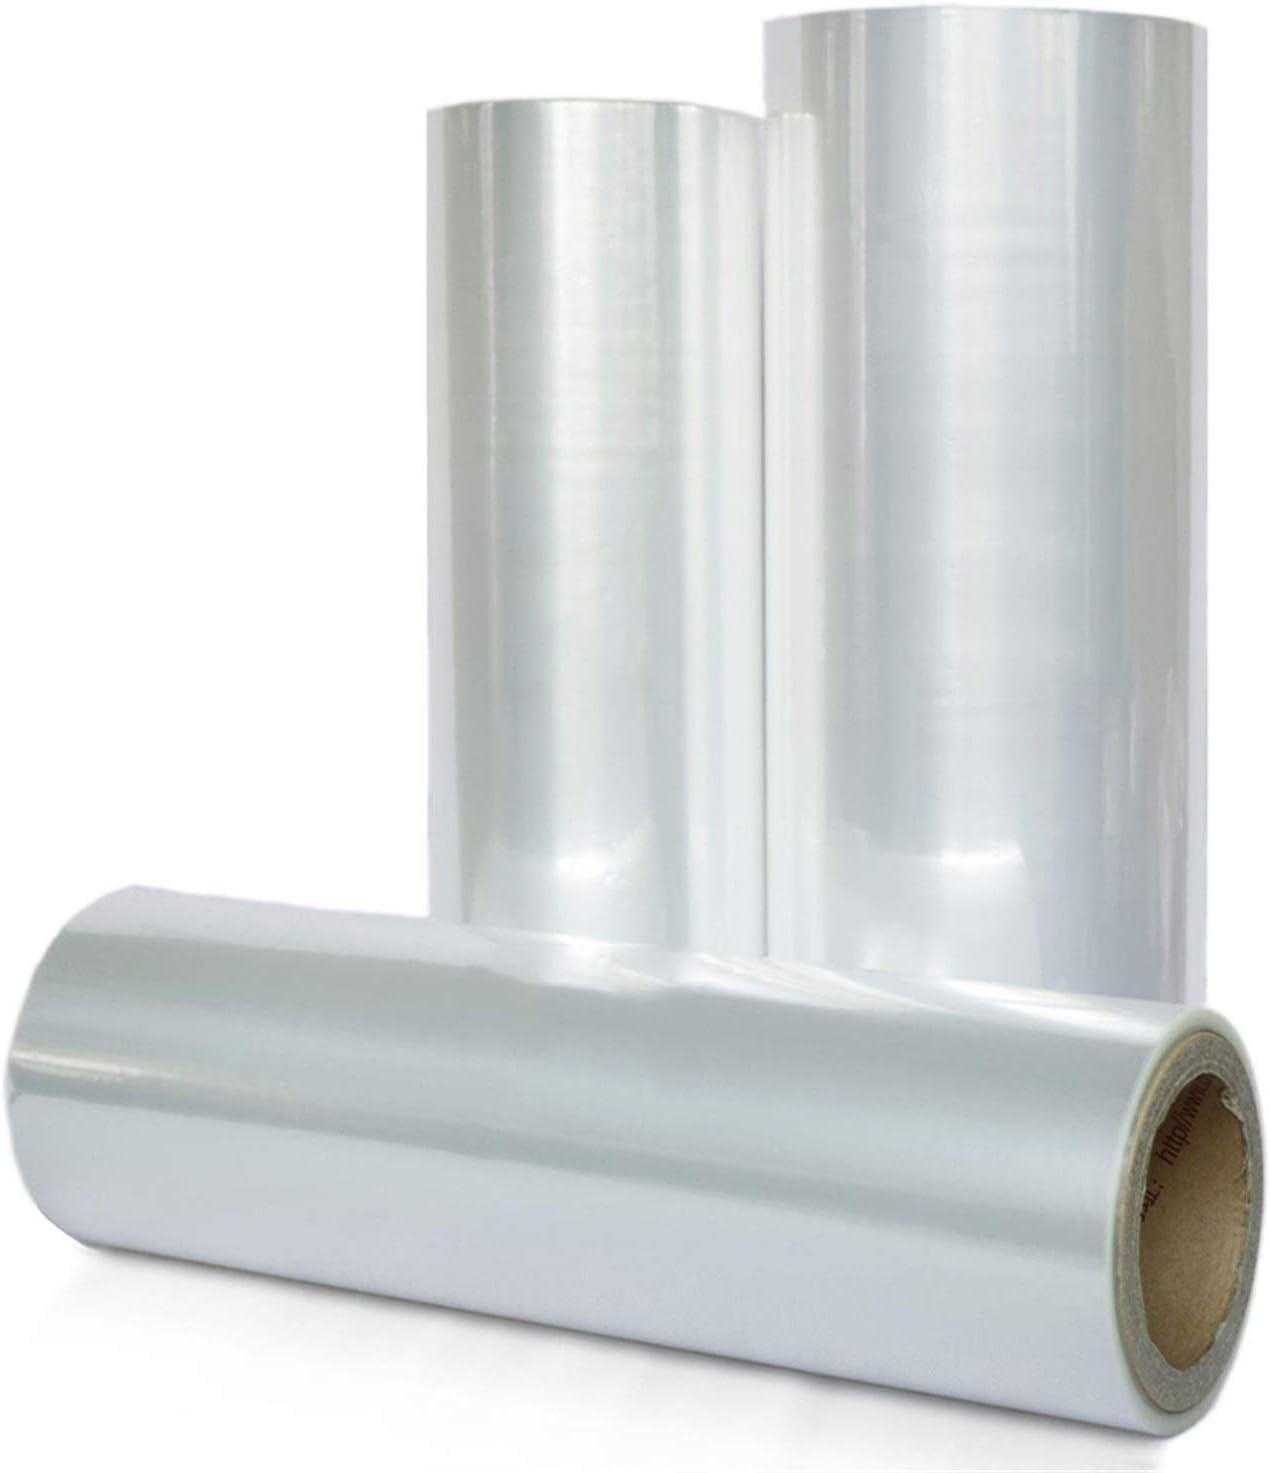 Tsautop Grootte 0 5m X 2 M 10 M Water Transfer Printing Kit Aquaprint Film Hydro Dompelen Kit Wdf048 1